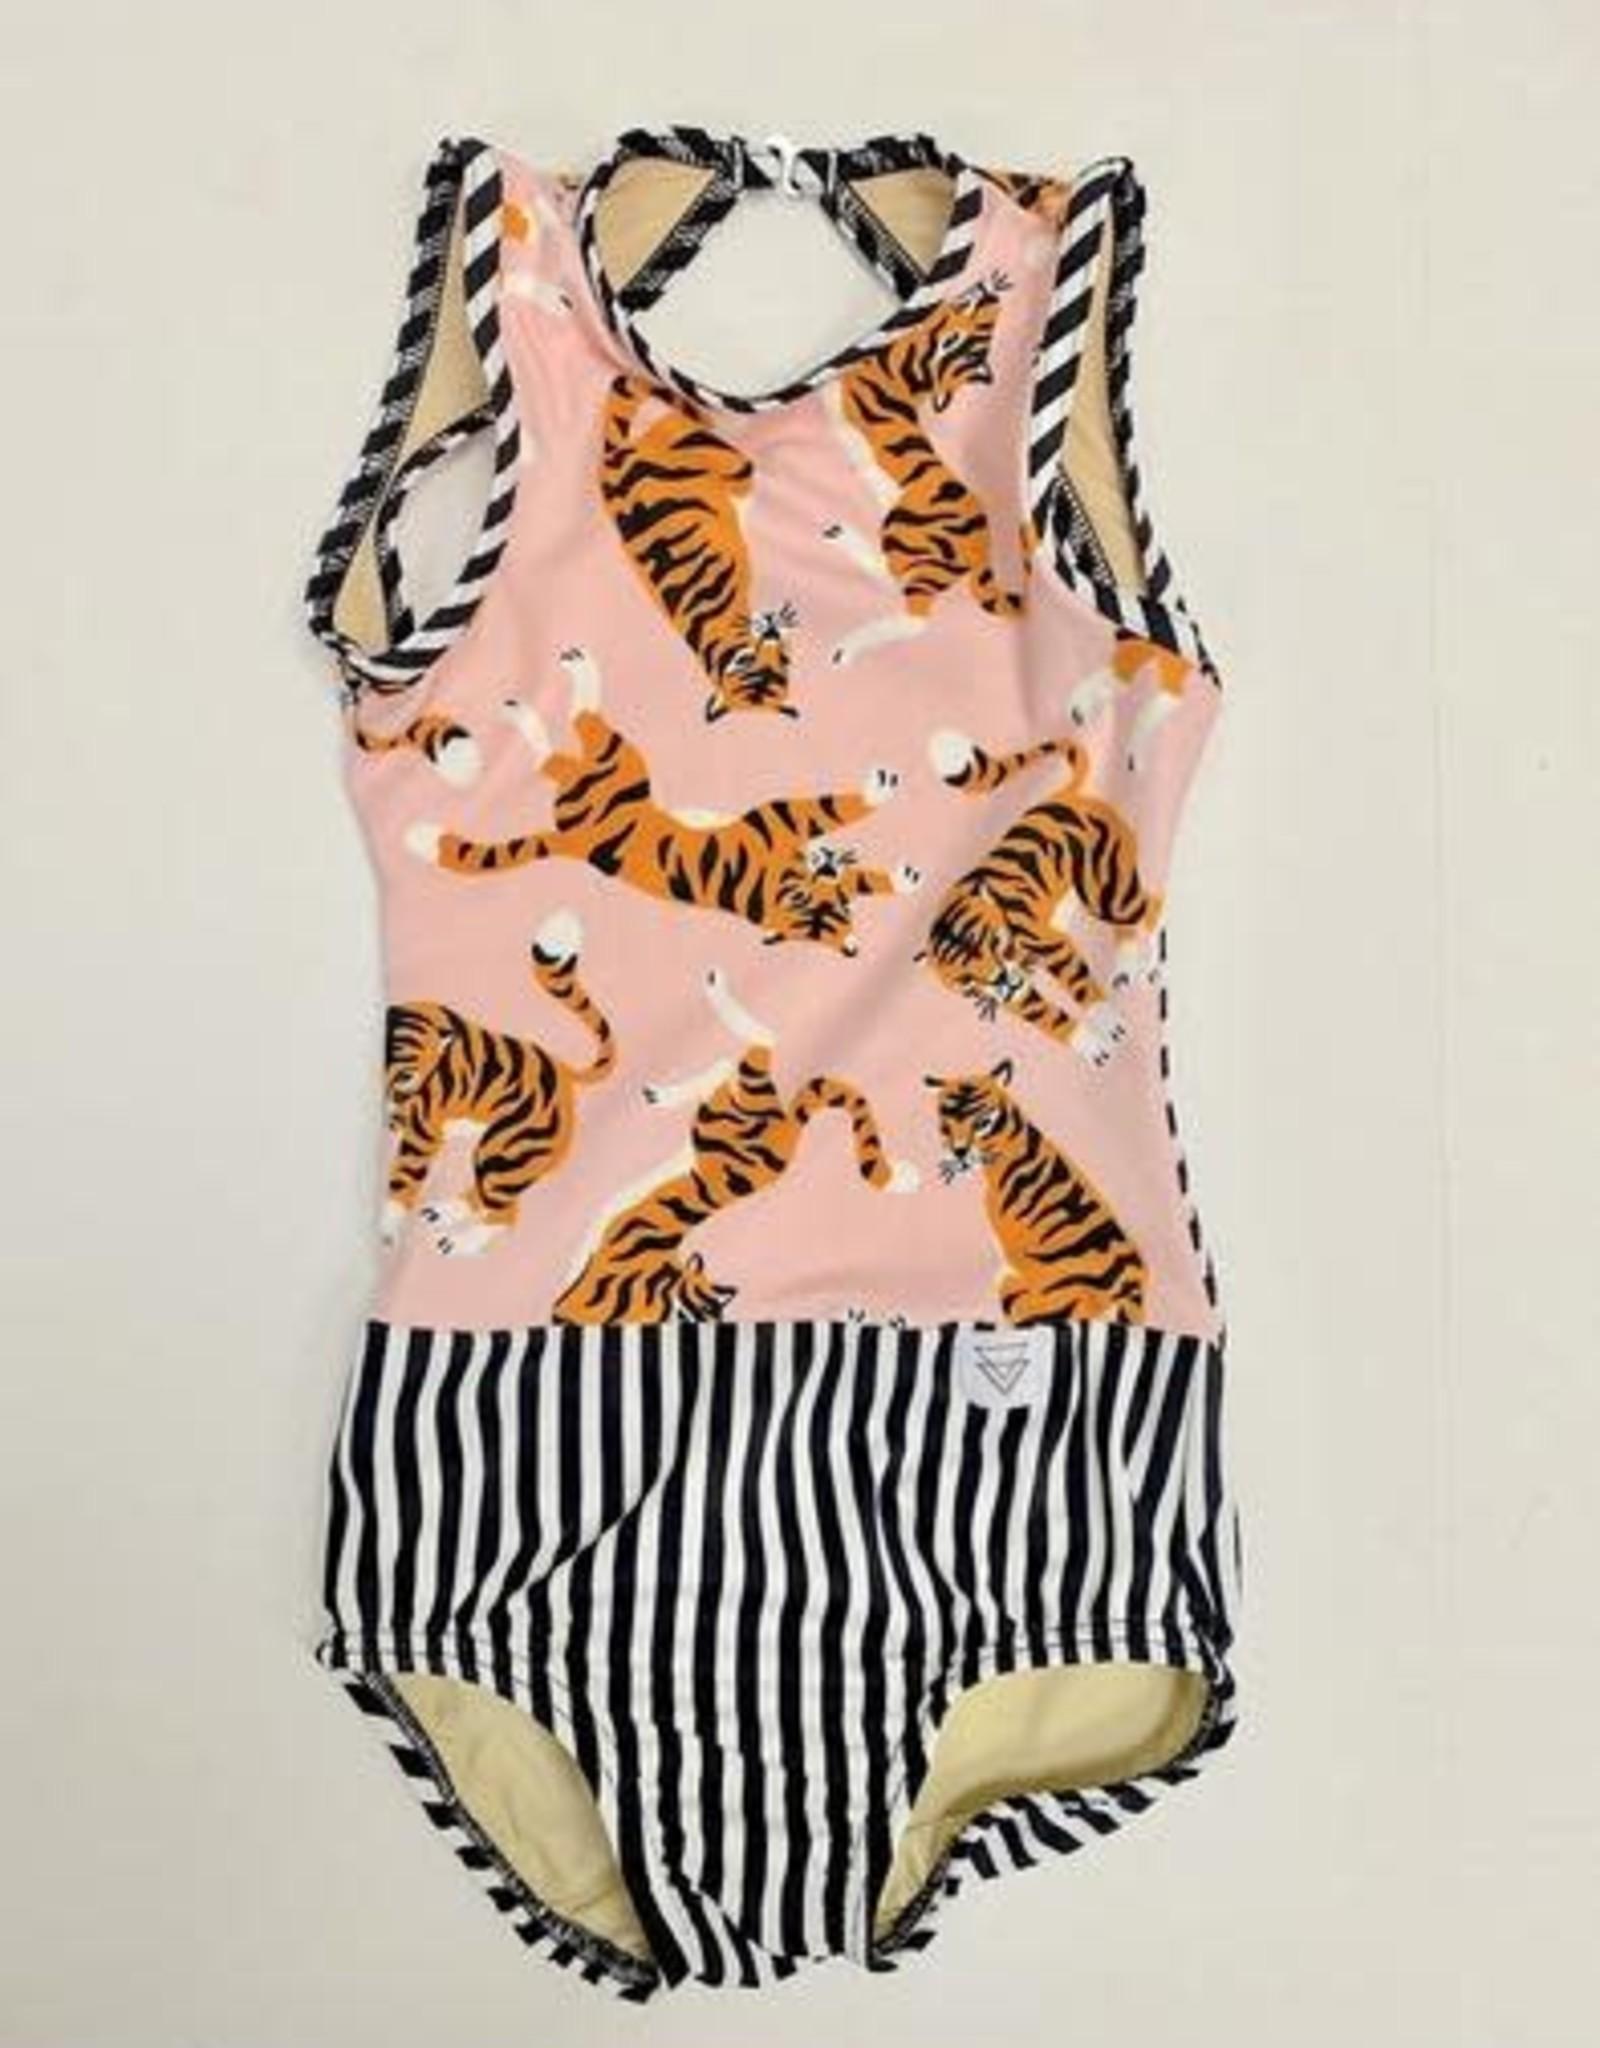 Lil Divas Dancewear The GiGi Leo // Tiger Queen